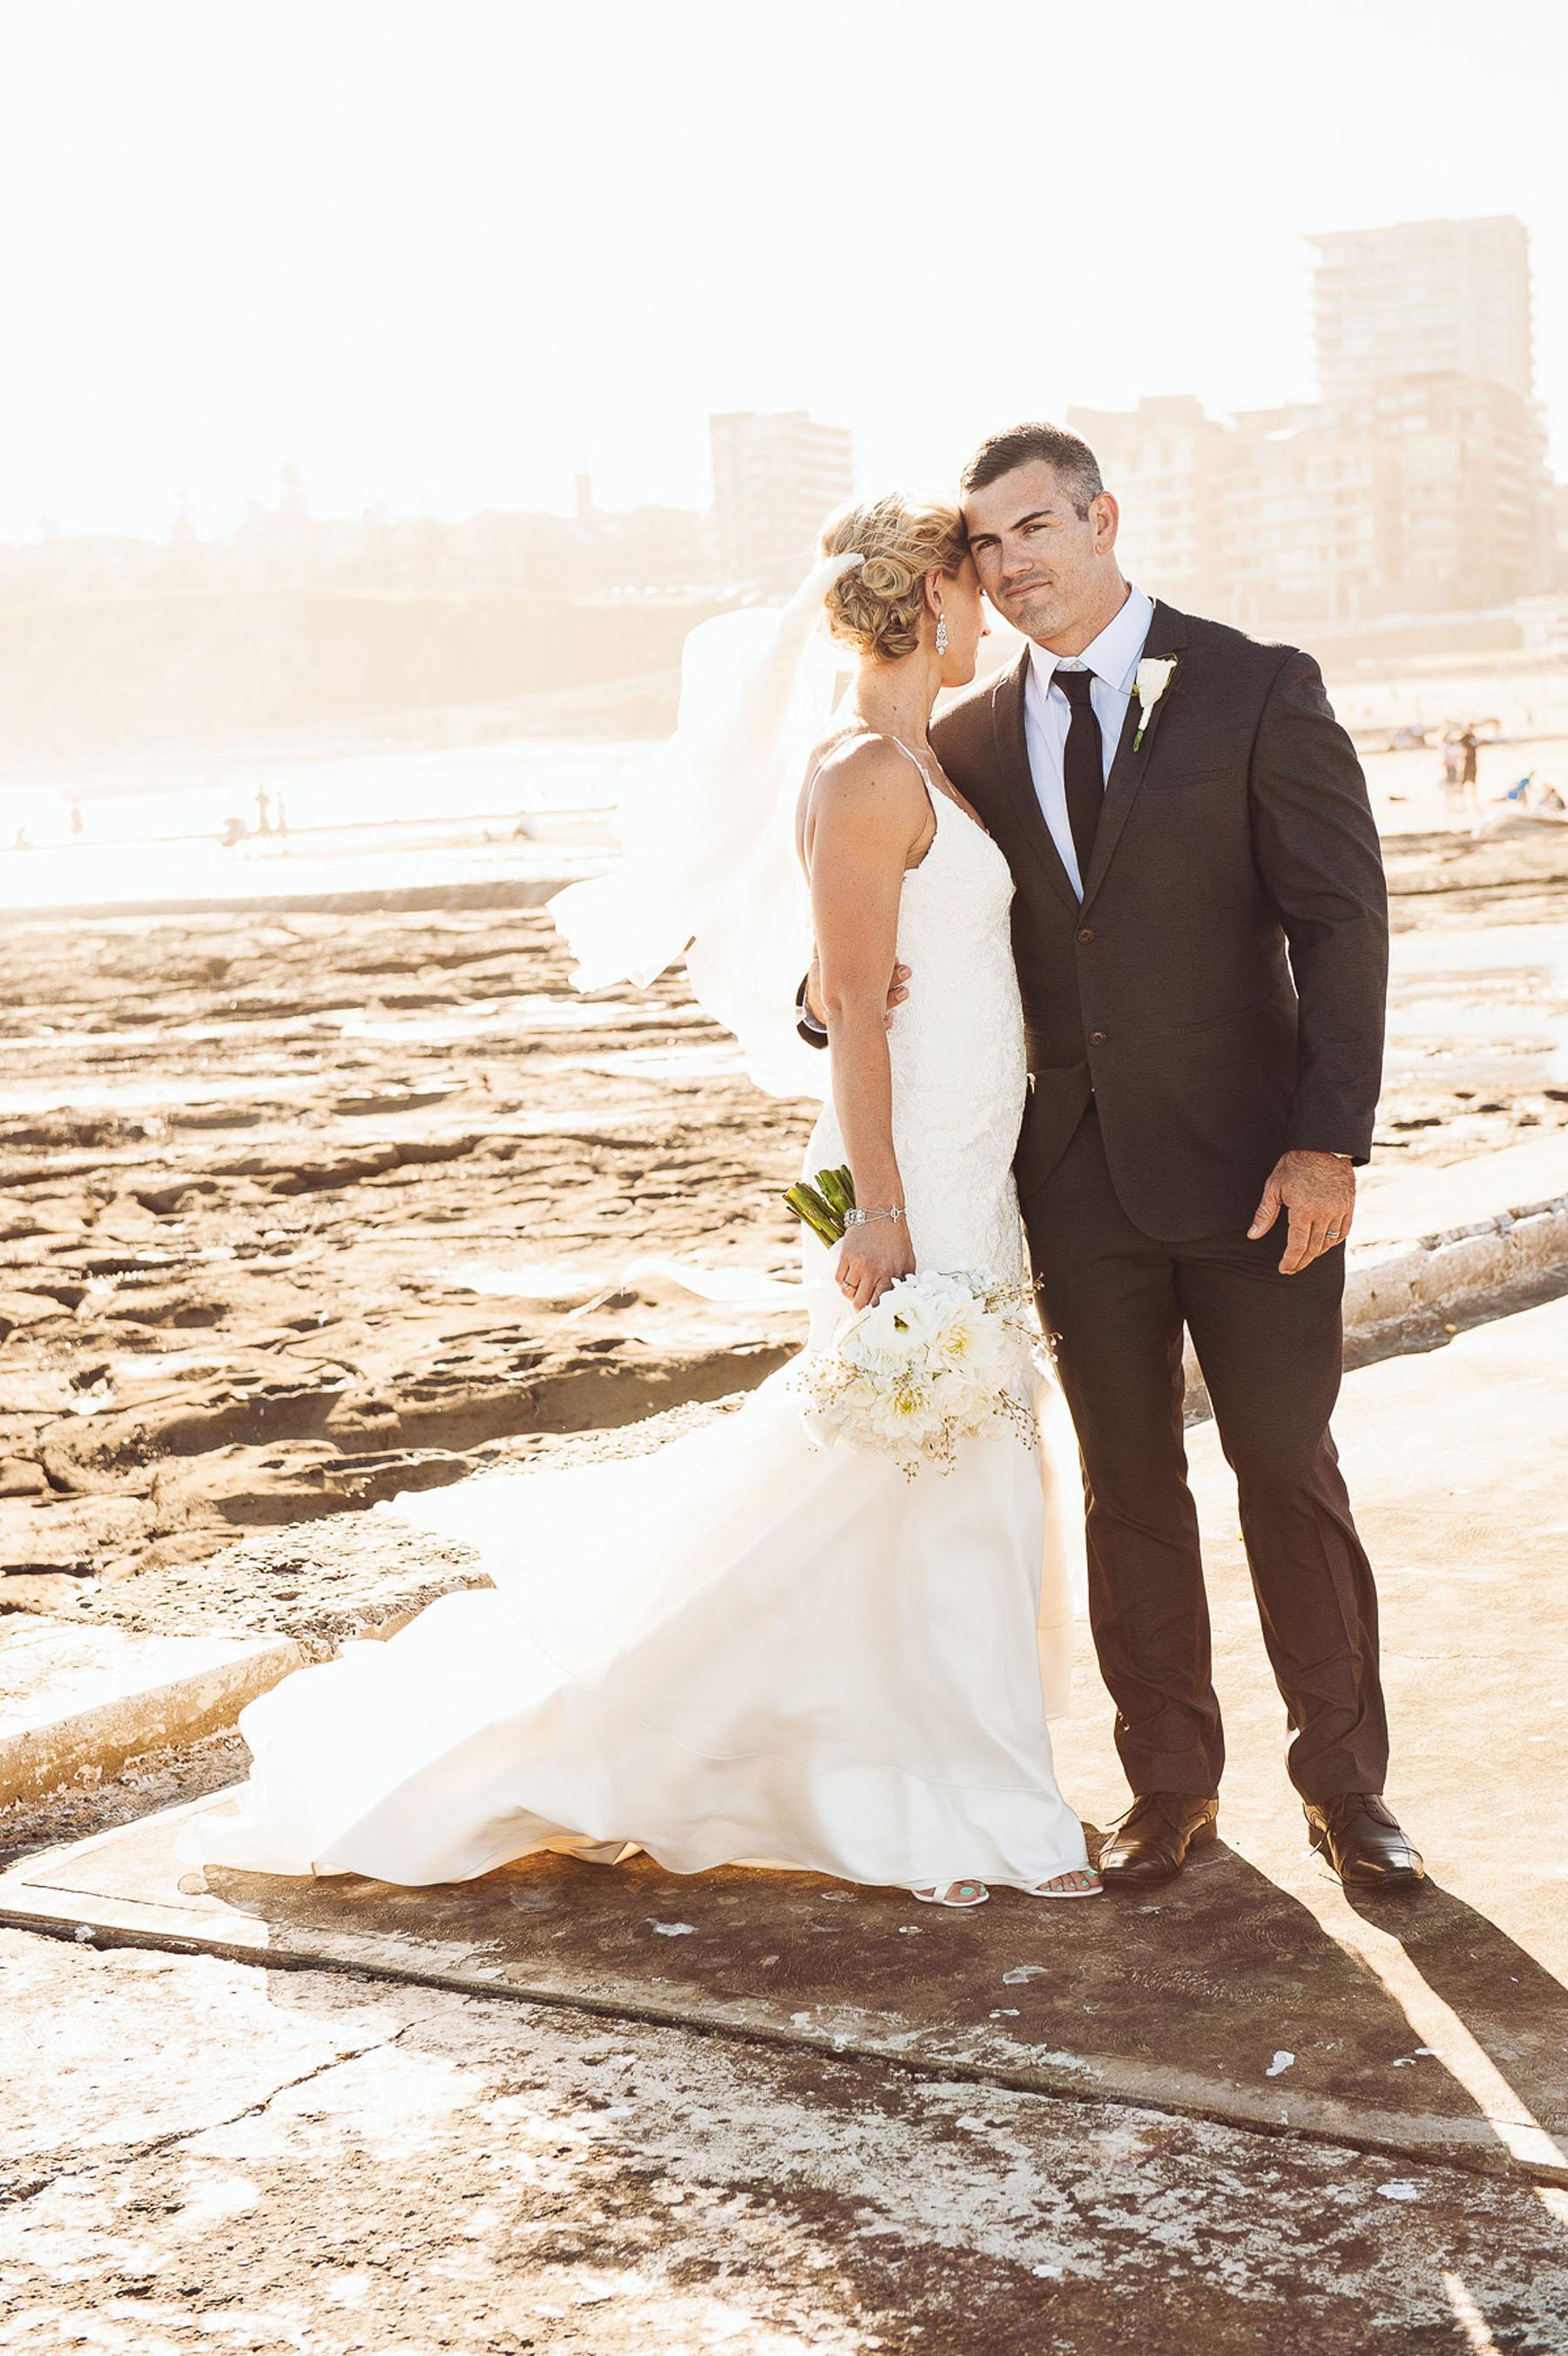 Marryme_wedding_photography_dorrigo_bellingen_photographer_41.jpg